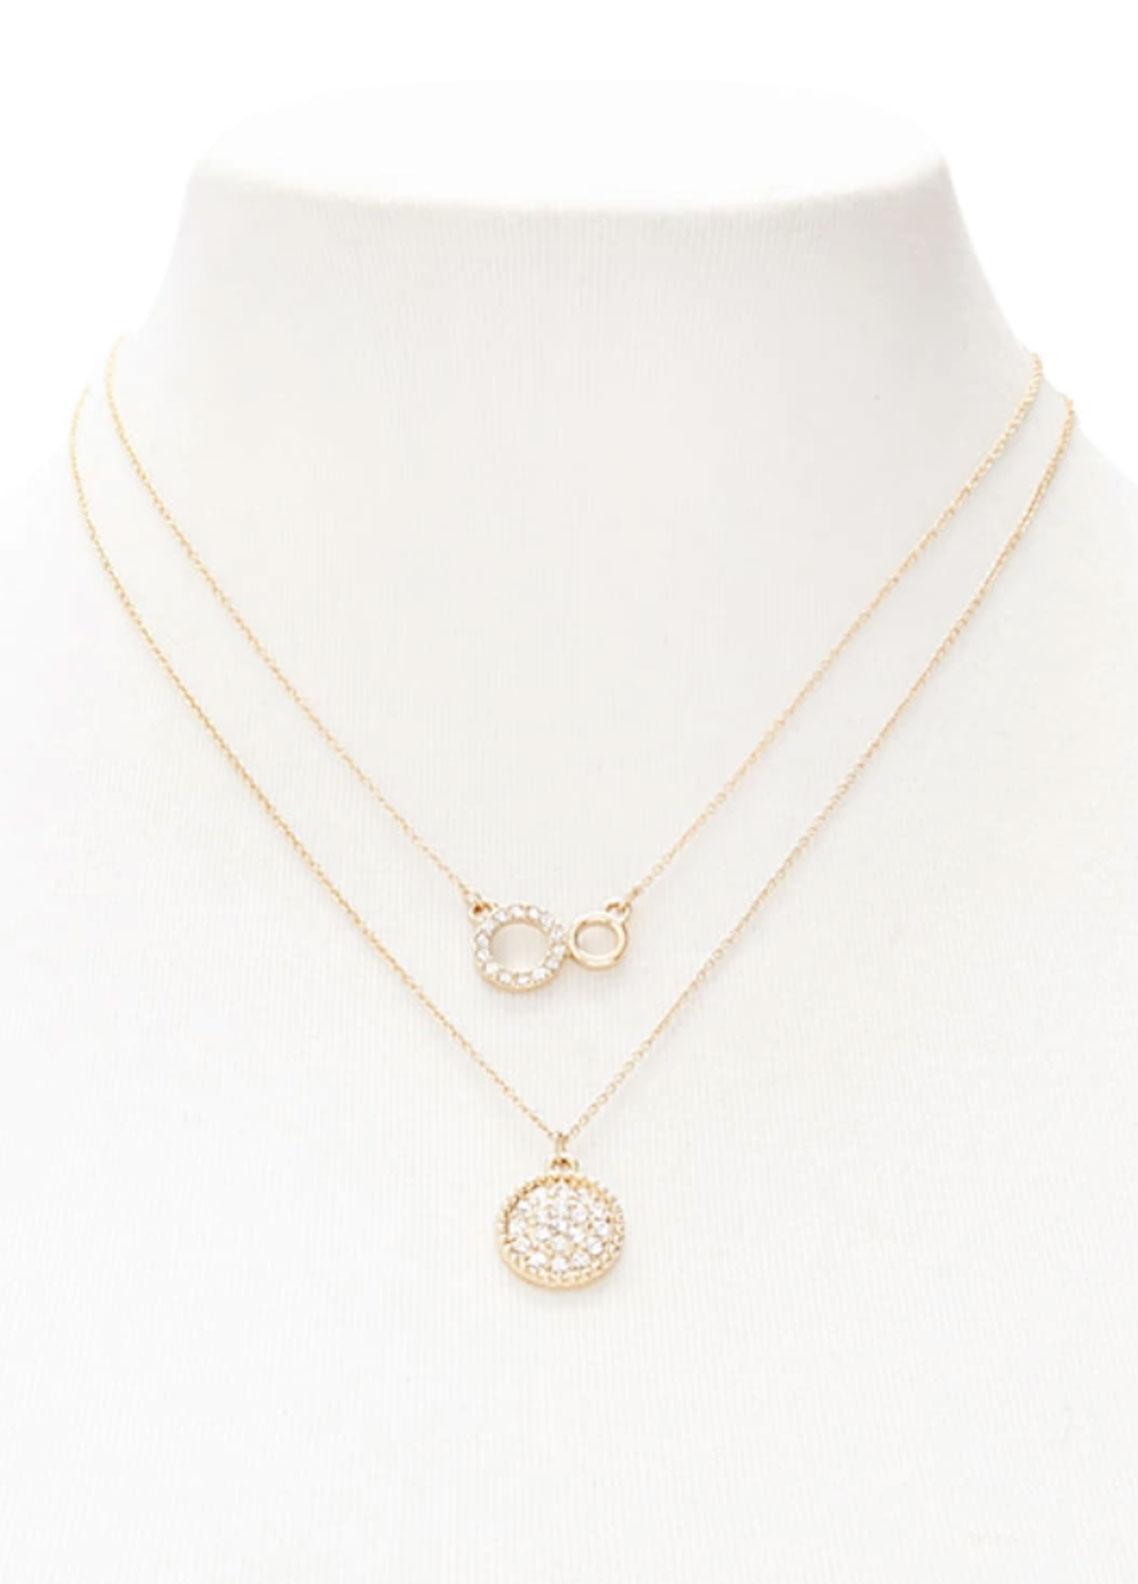 Forever21 RhinestonePendant Necklace Set  - Ladies Jewellery